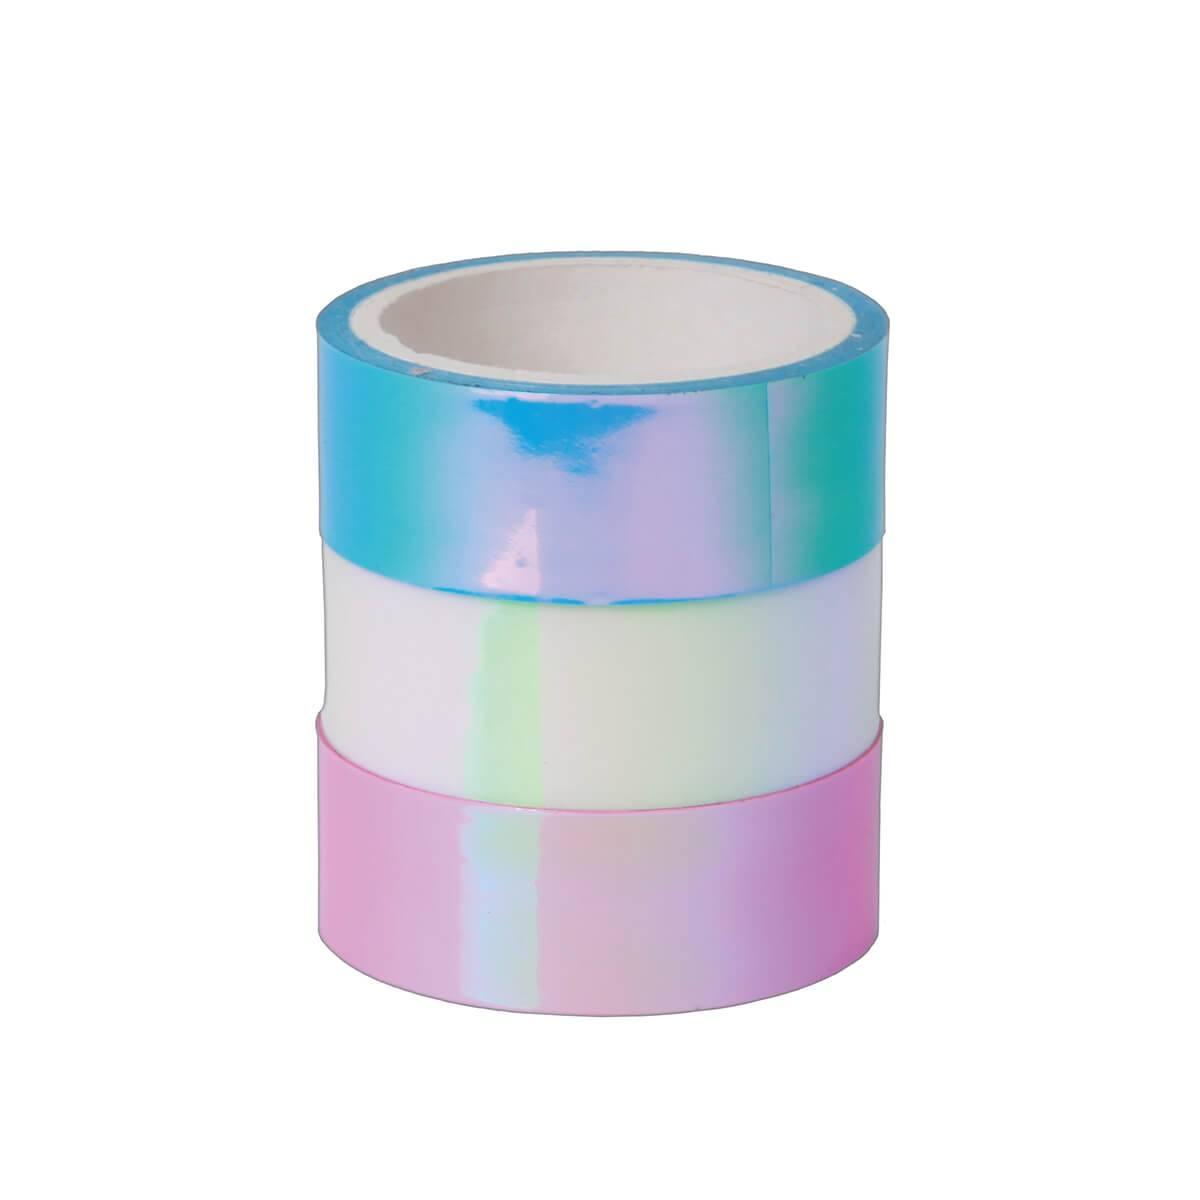 Fita Adesiva Holográfica 15mmX5m - Blister C/ 3 Unid - Tilibra